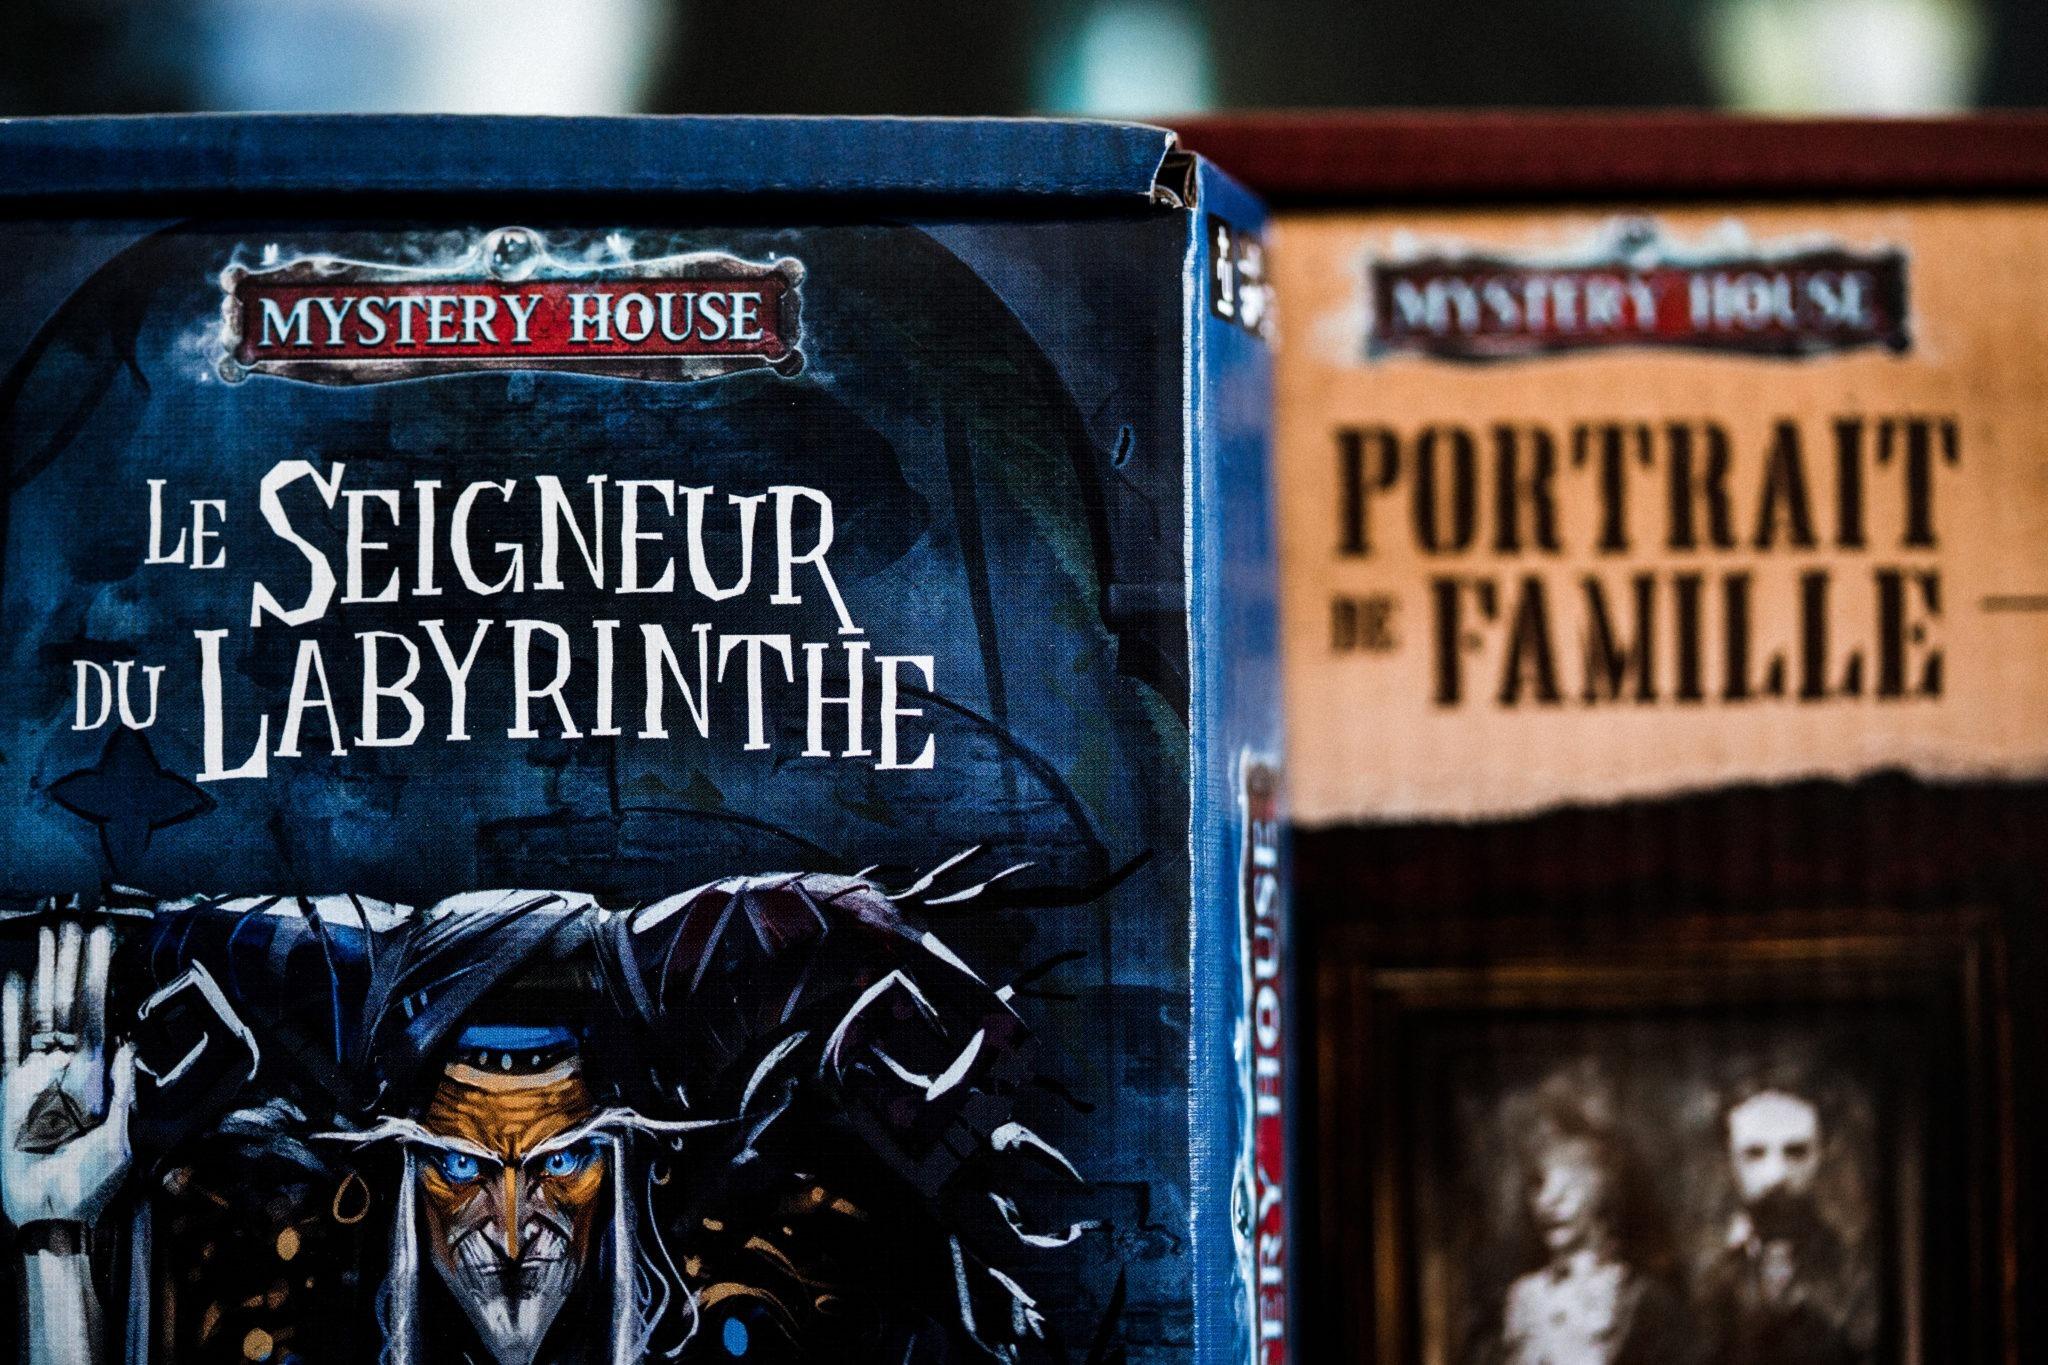 Mystery house gigamic jeu société escape